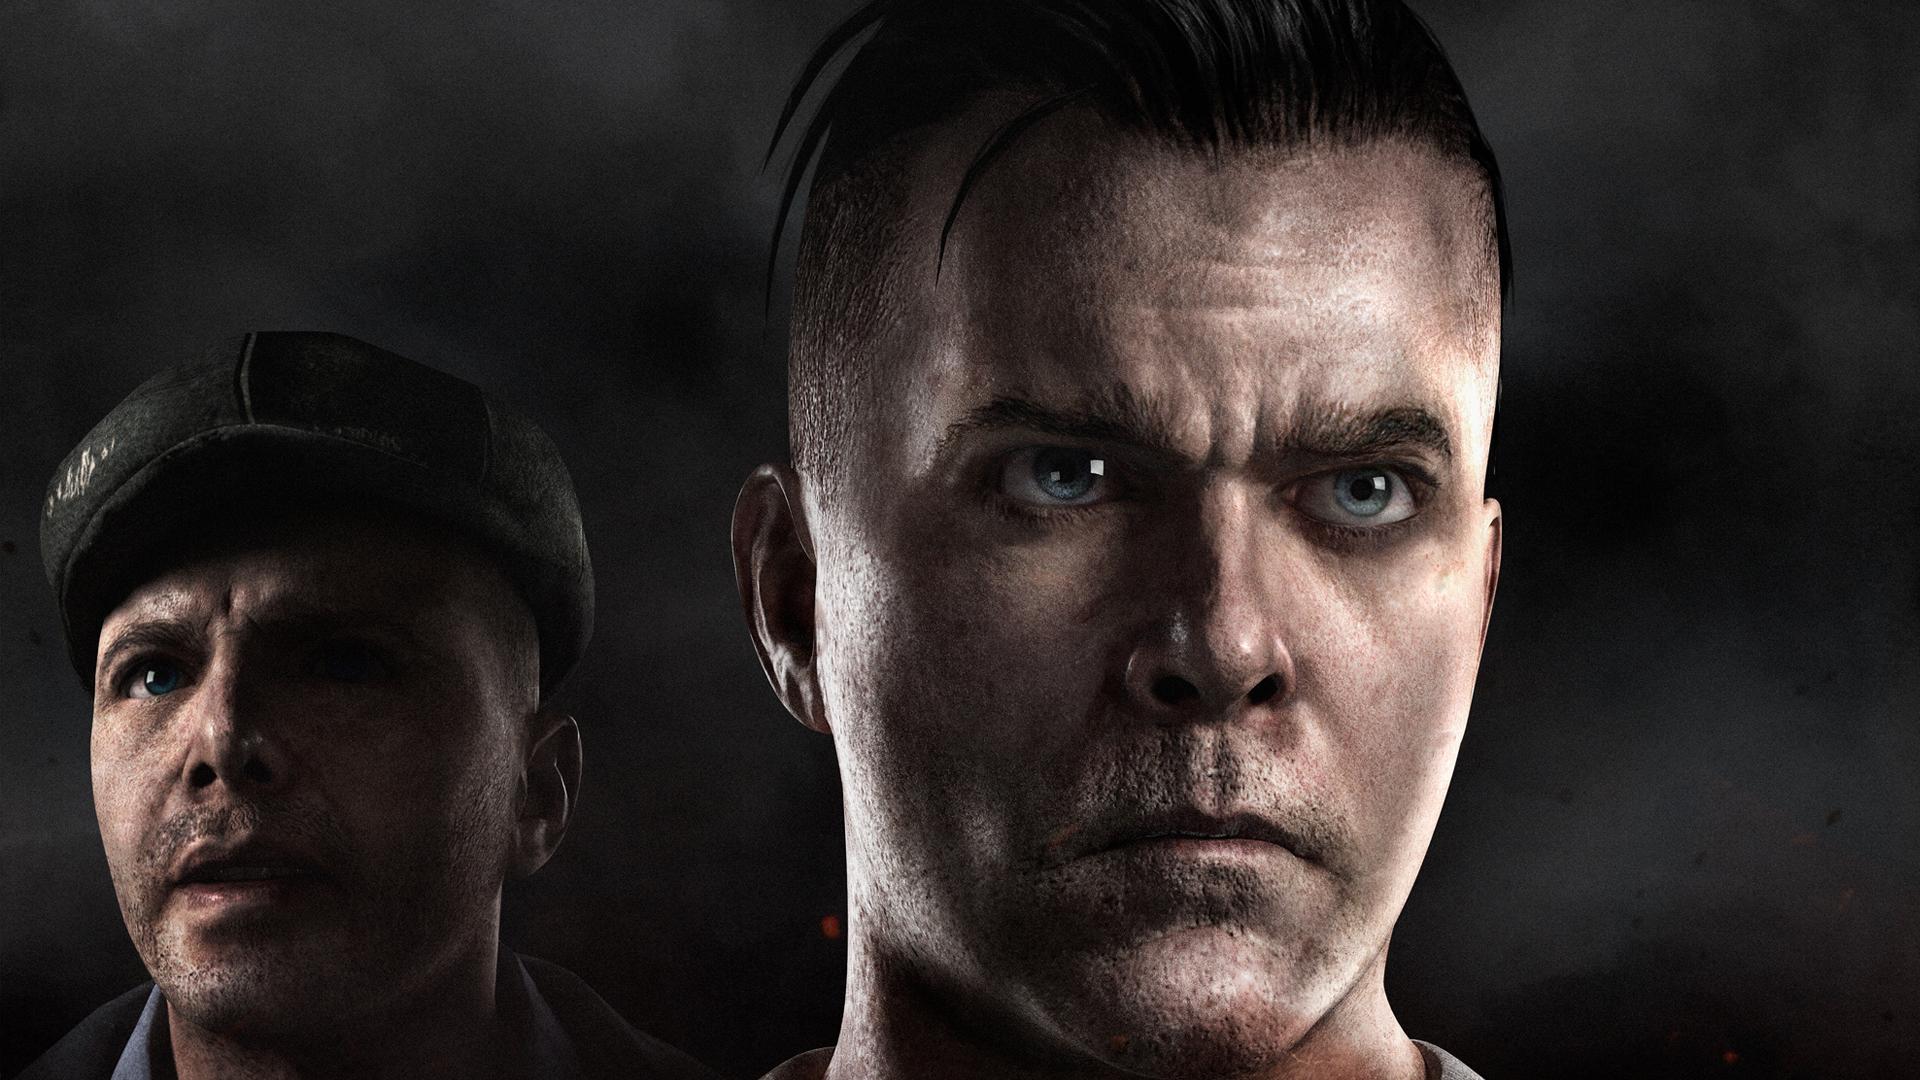 Call of Duty: Black Ops II Zombies - Billy & Weasel | Steam